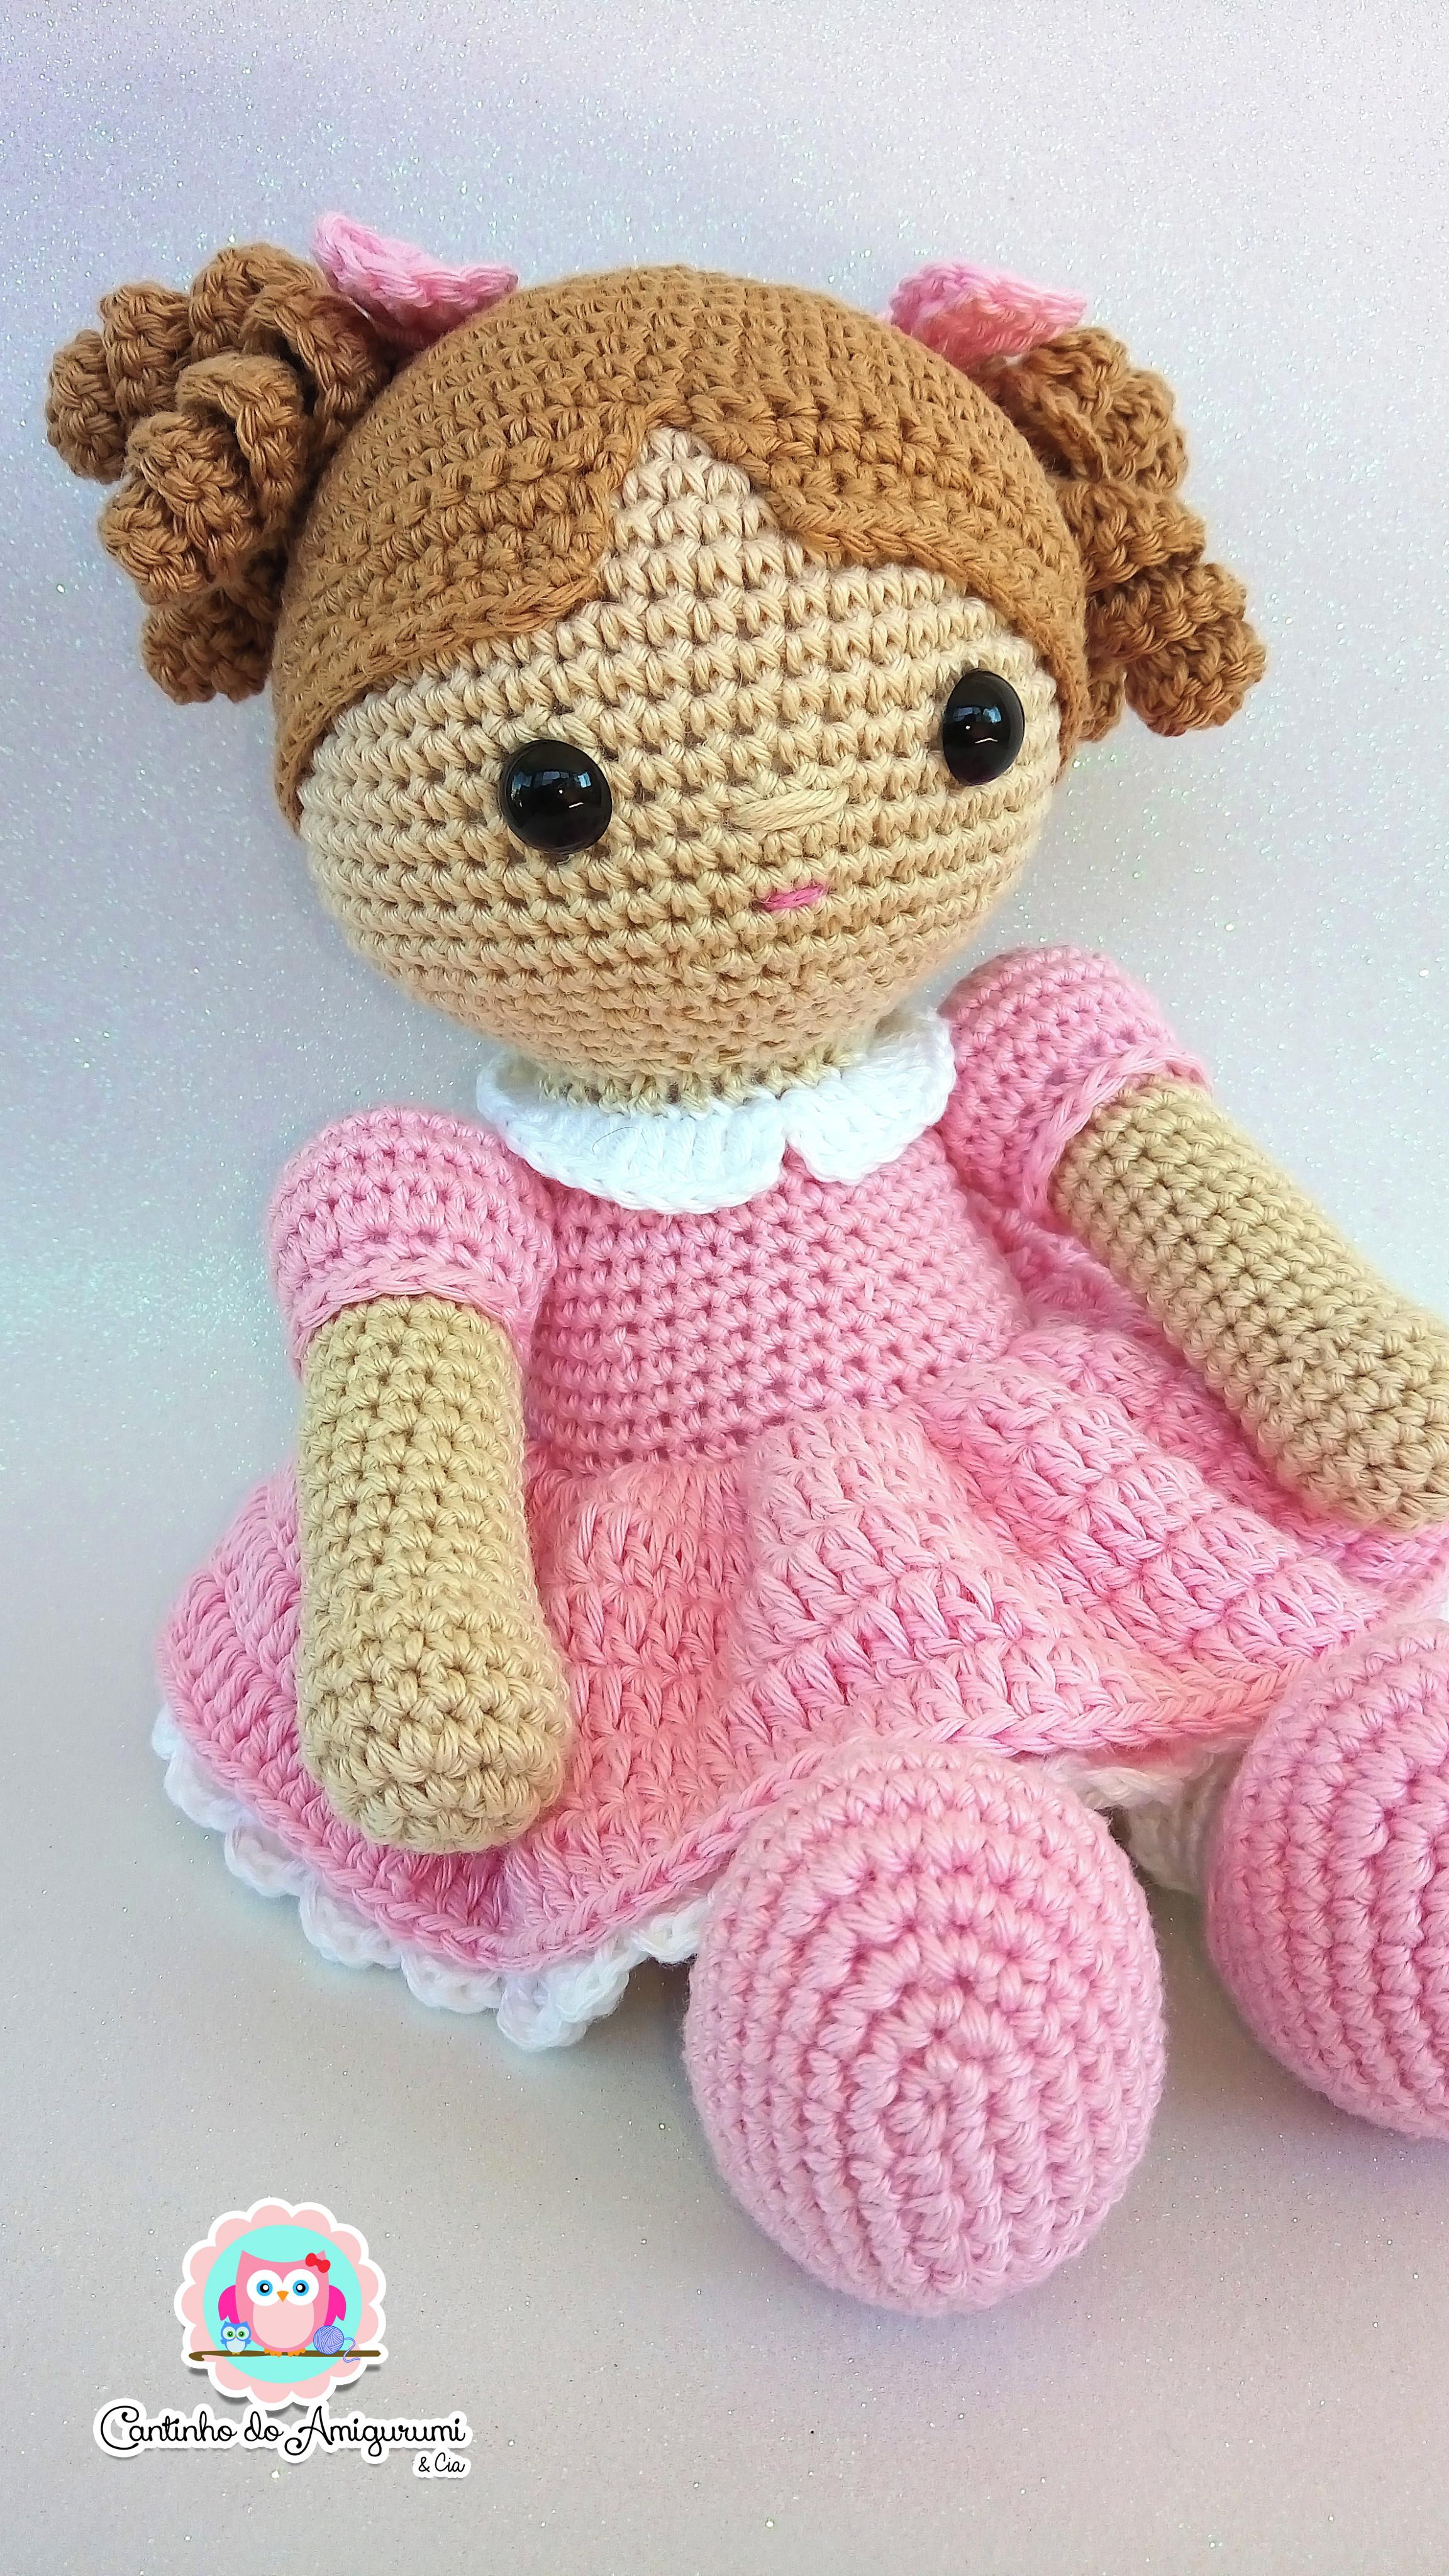 Boneca de crochê: +40 ideias com amigurumi fantásticas ... | 4096x2304